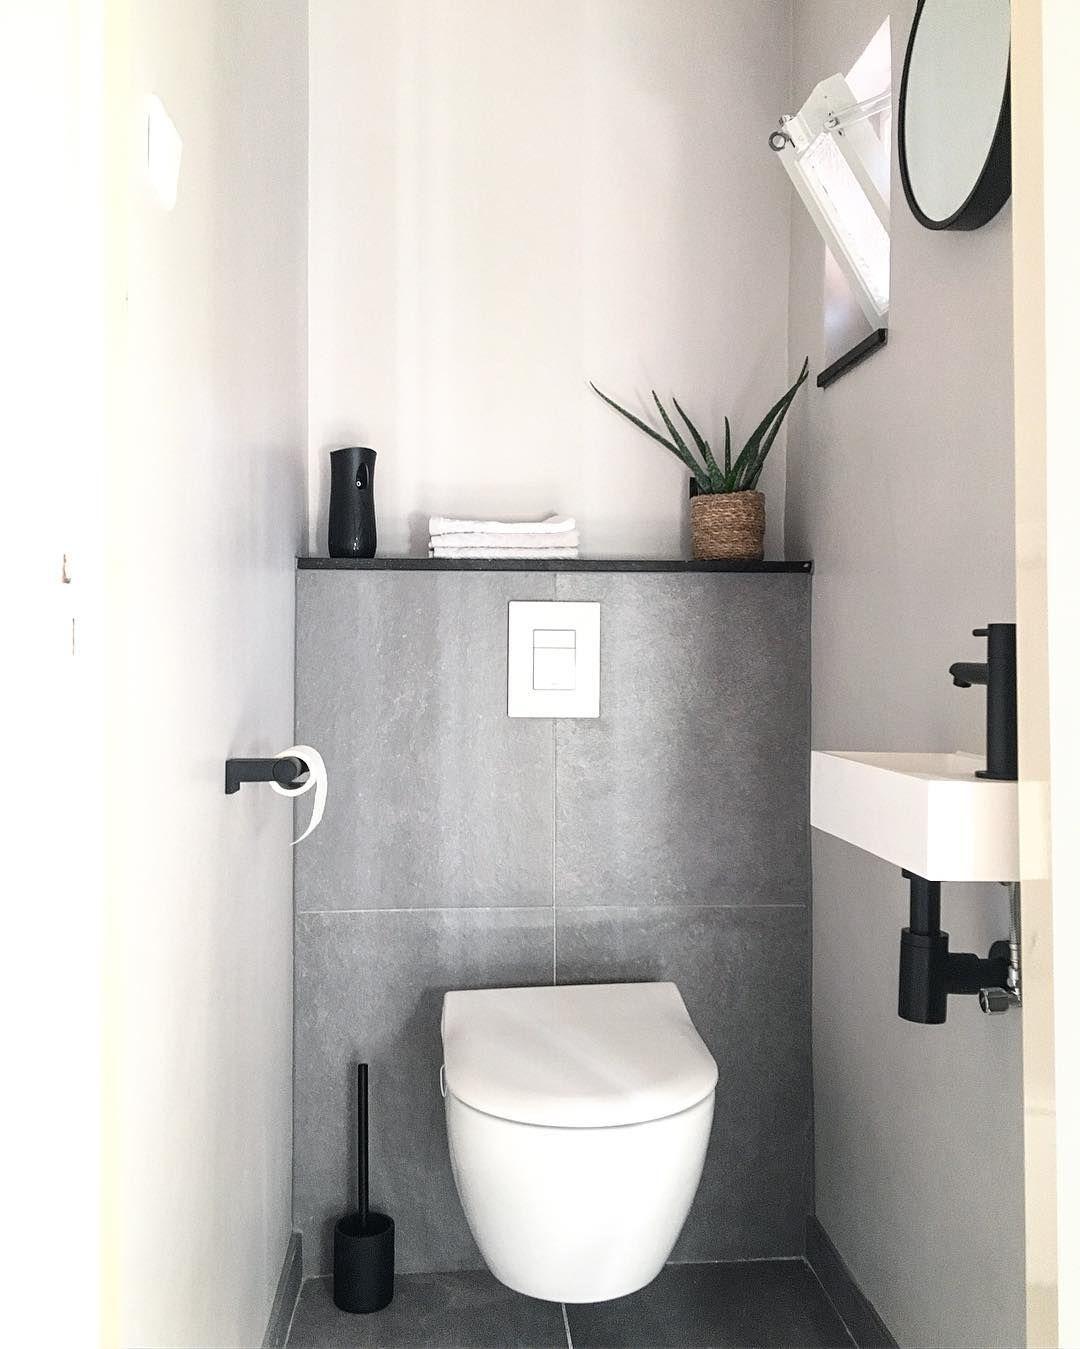 New The 10 Best Home Decor With Pictures R E N O V A T I E Van Het Kleinste Kamertje In Huis Op Wat Toilet Ontwerp Toilet Verbouwing Toilet Decoratie